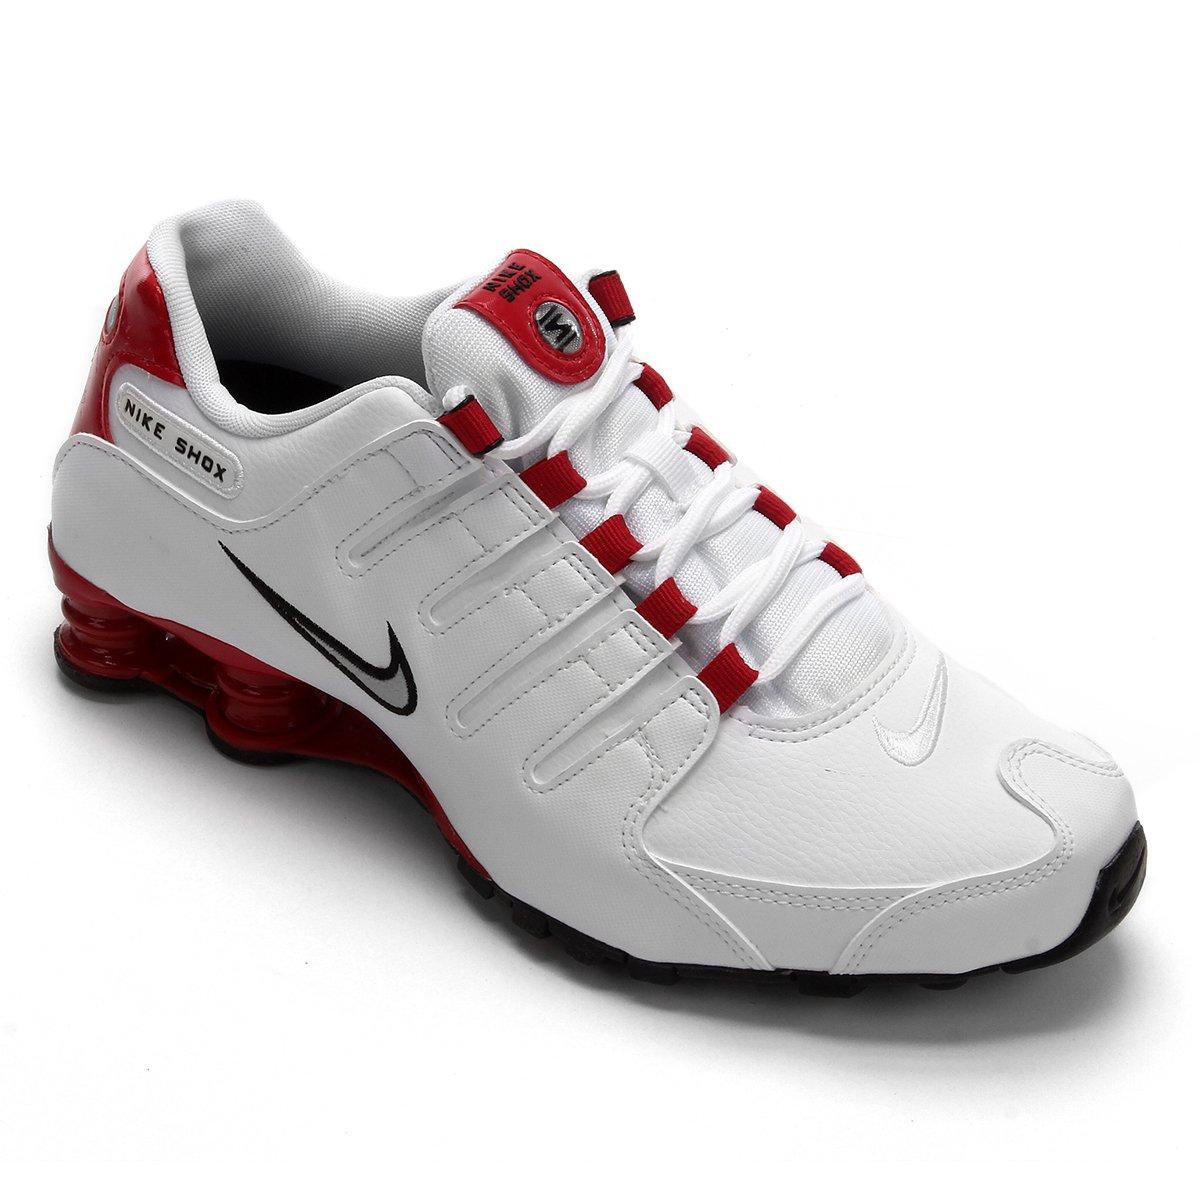 best service 3bcd5 4db46 Tênis Nike Shox Nz Masculino - Branco e Vermelho